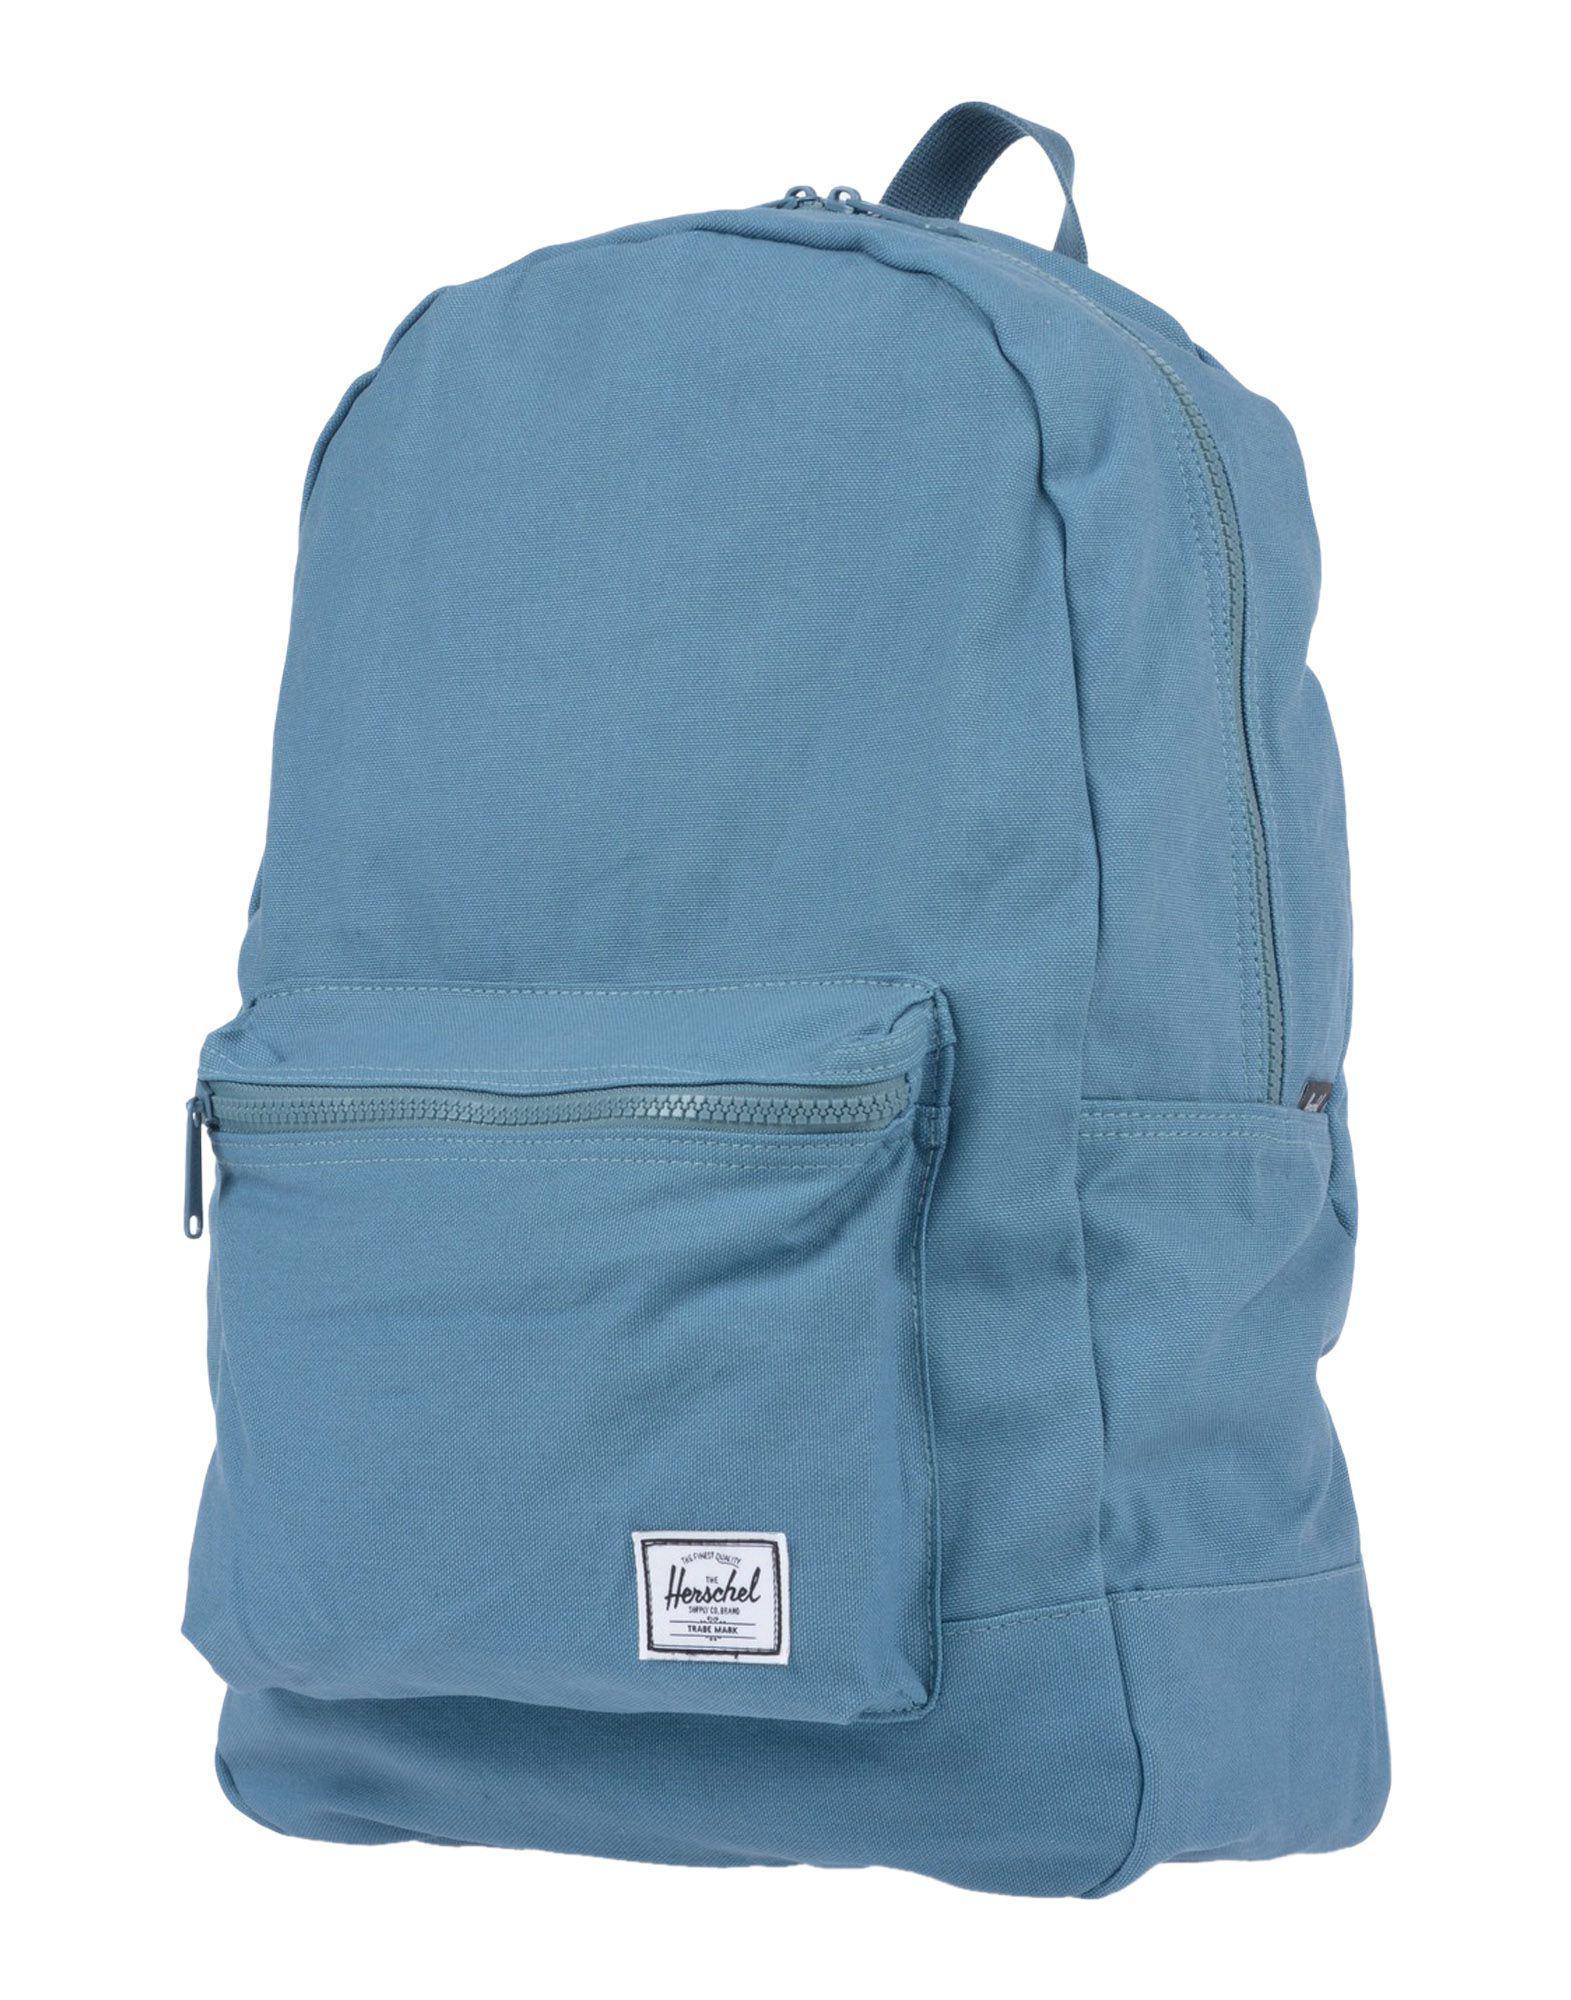 034614994b6 Lyst - Herschel Supply Co. Backpacks   Fanny Packs in Blue for Men